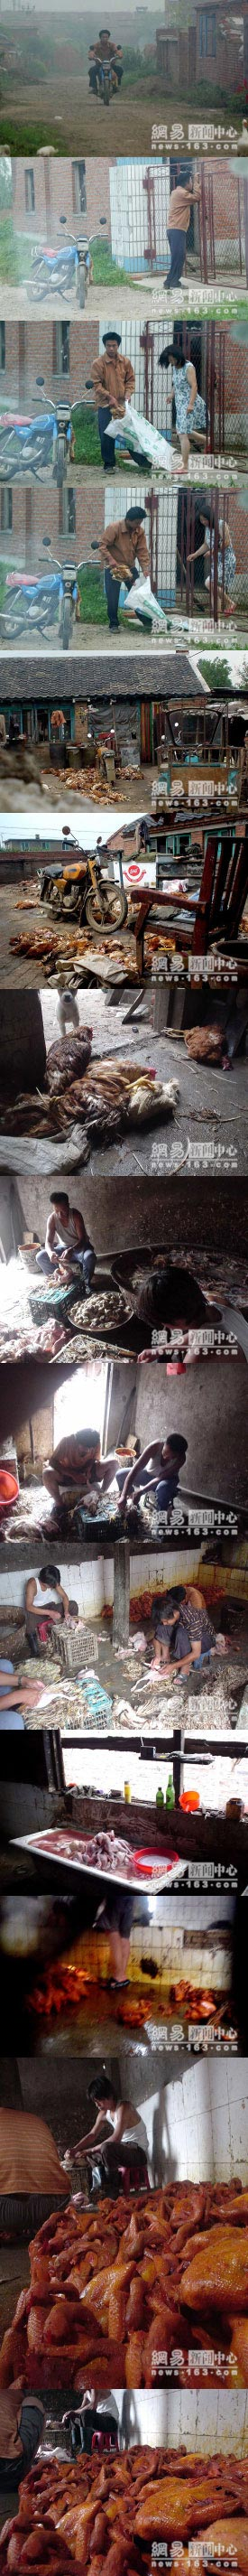 chicken-processing-in-china.jpg